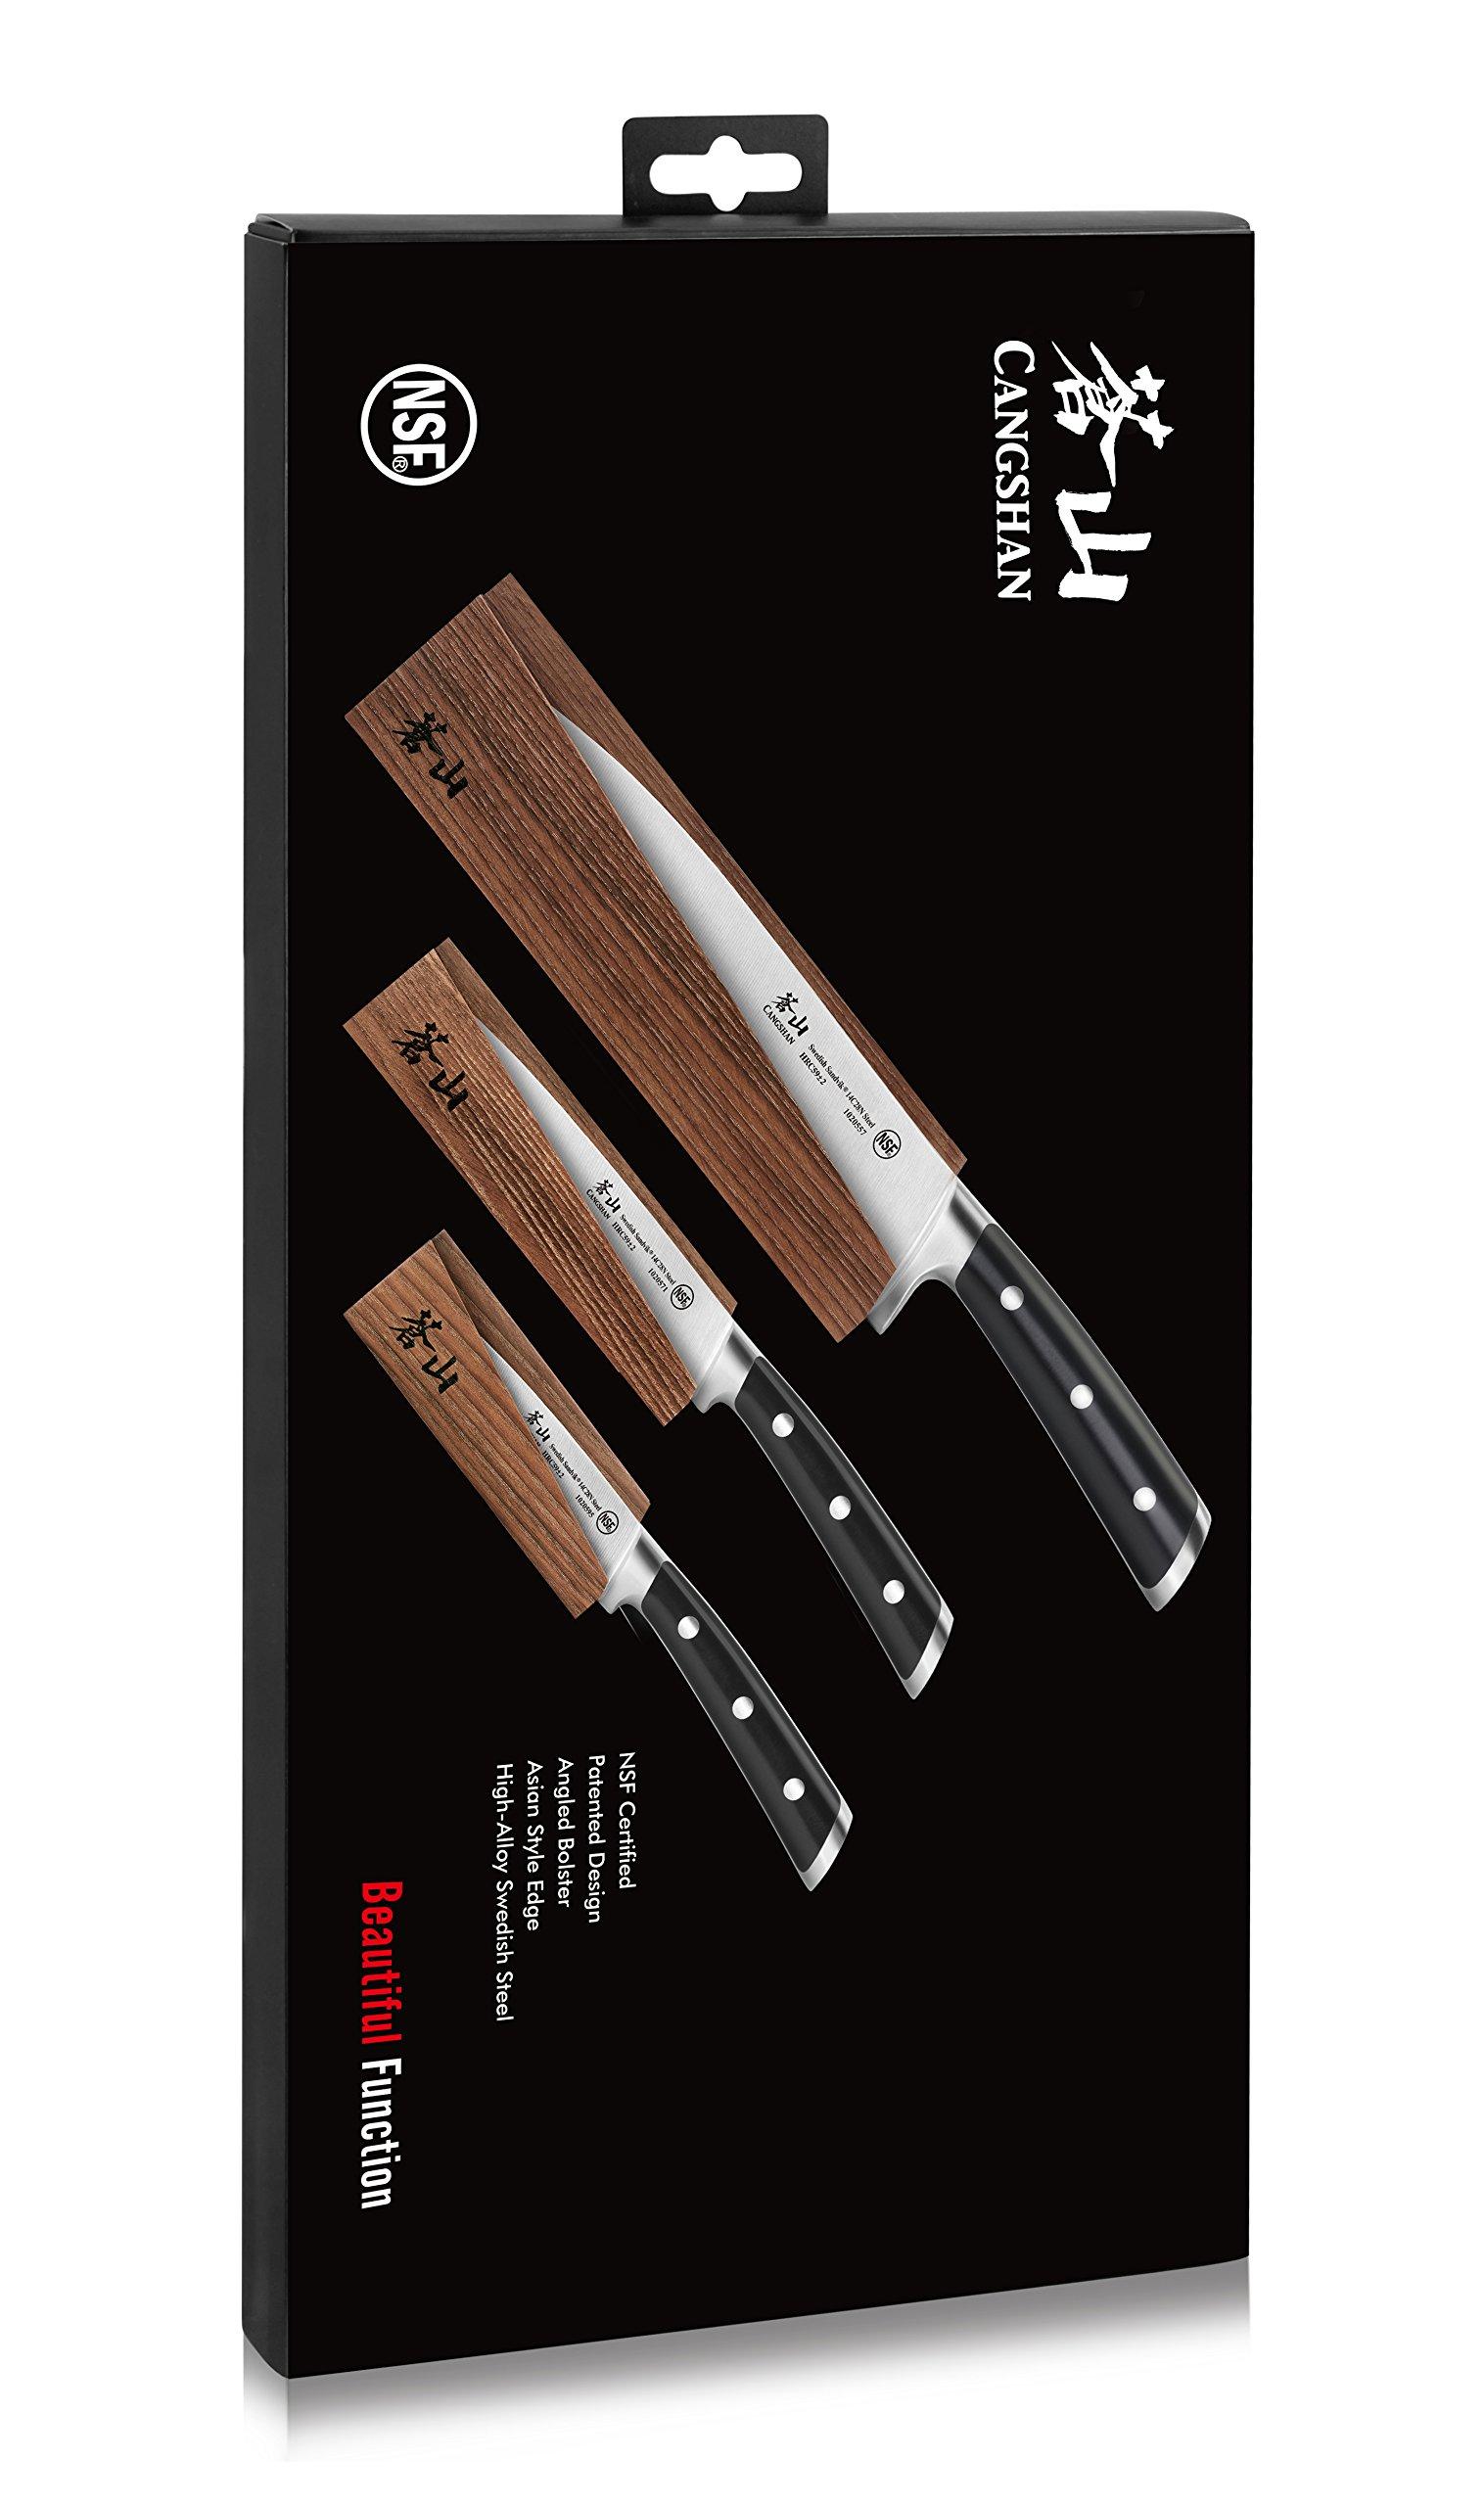 Cangshan TS Series 1020854 Swedish Sandvik 14C28N Steel Forged 3-Piece Starter Knife Set with Wood Sheaths